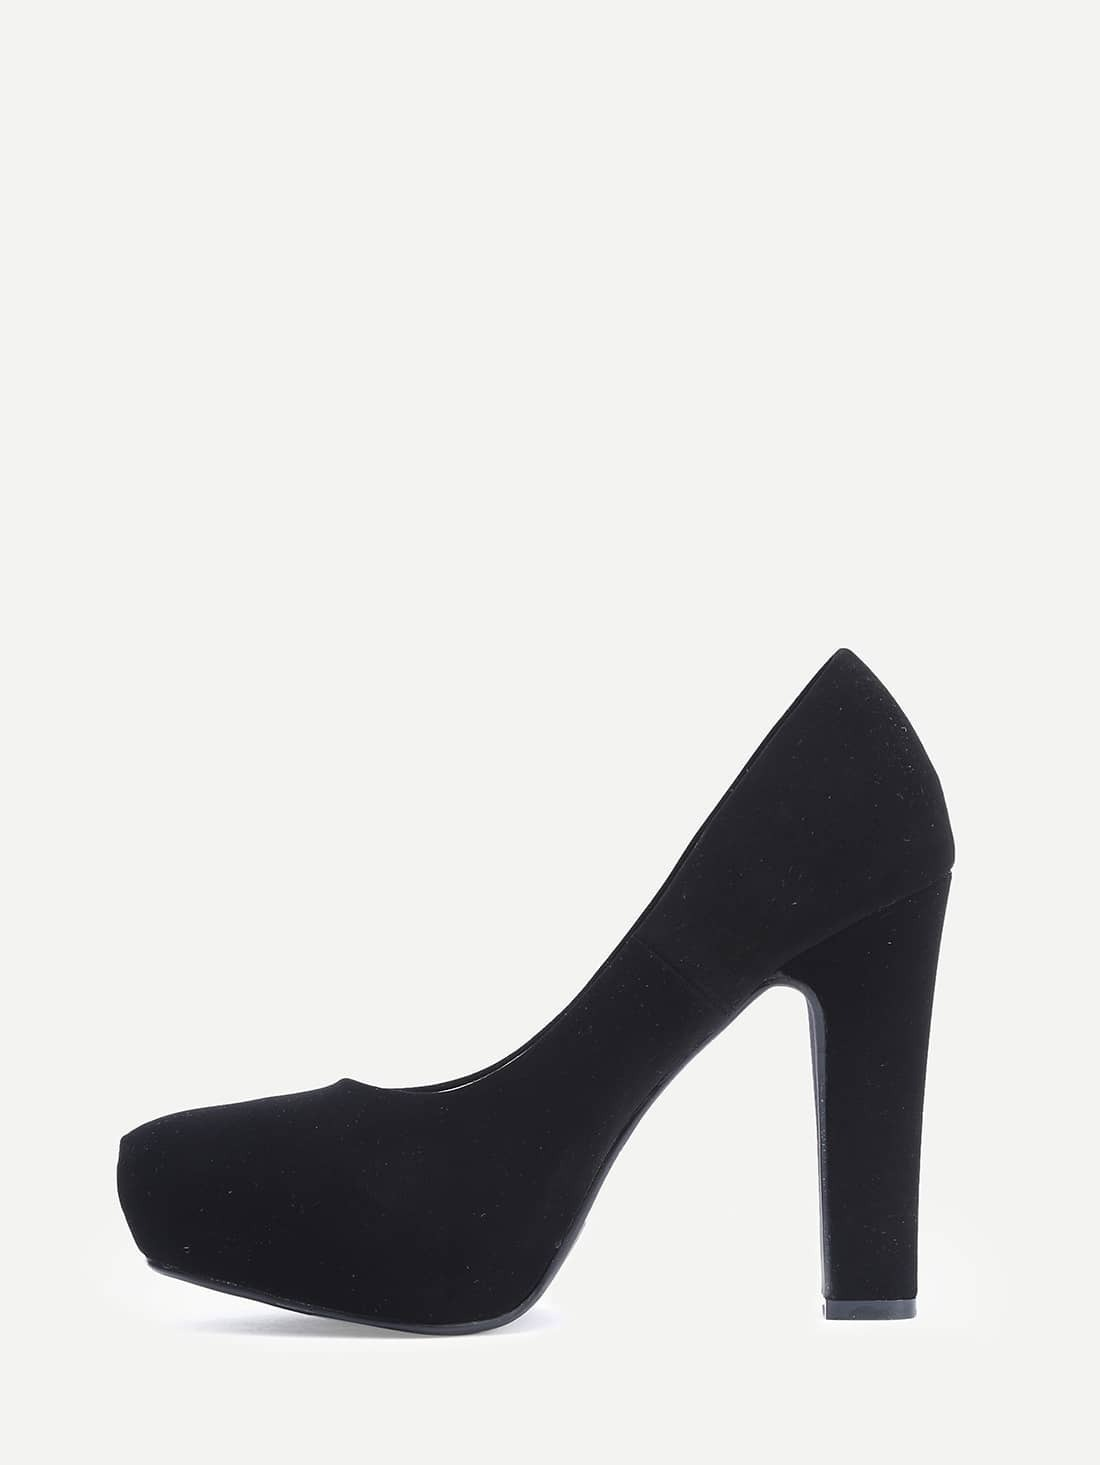 Black Platform Pumps Thick Heel